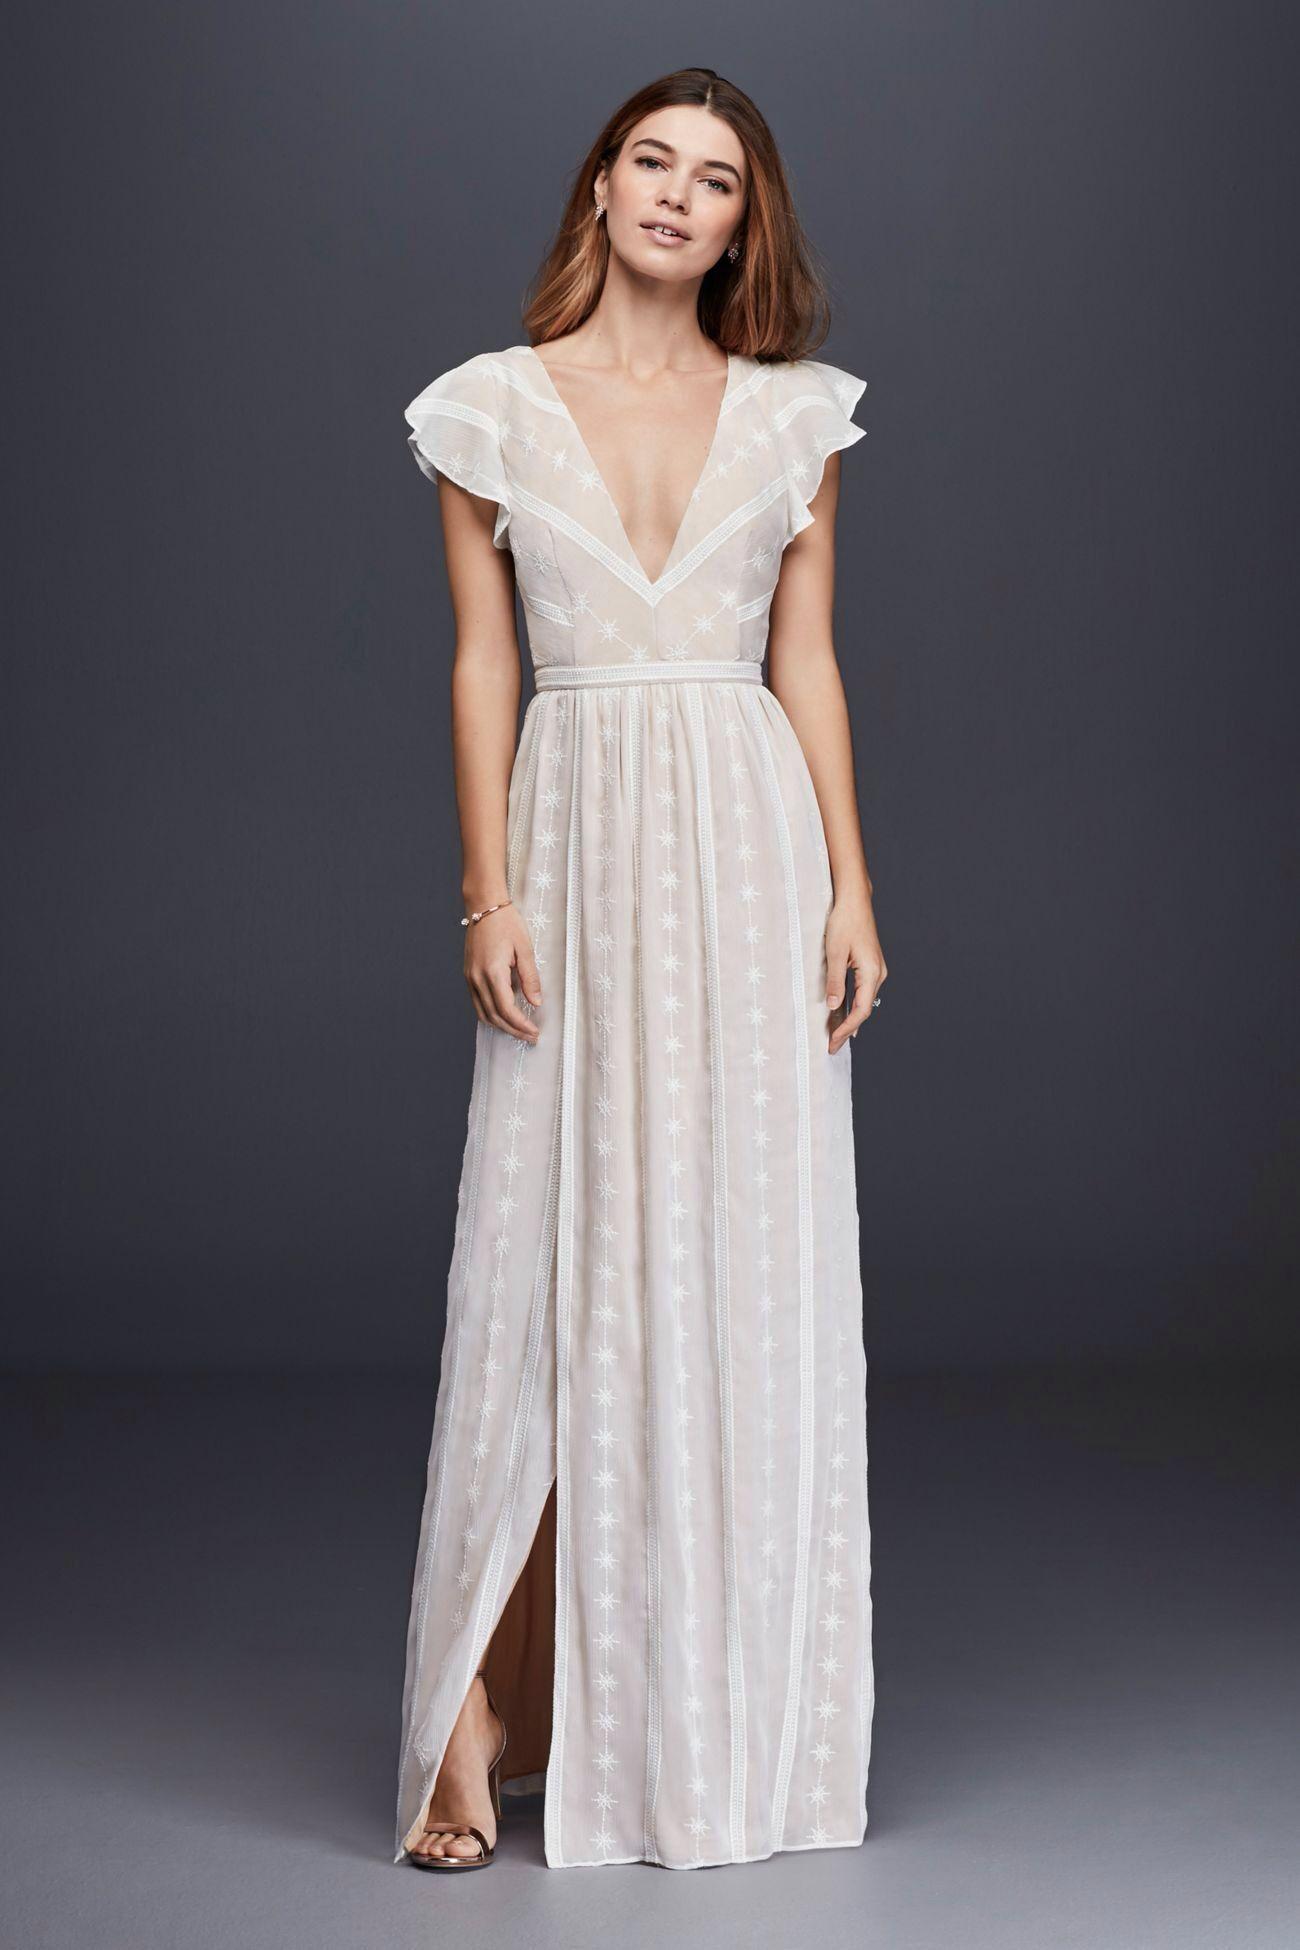 My New Favorite! www.davidsbridal.com/10758300 | W dresses ...